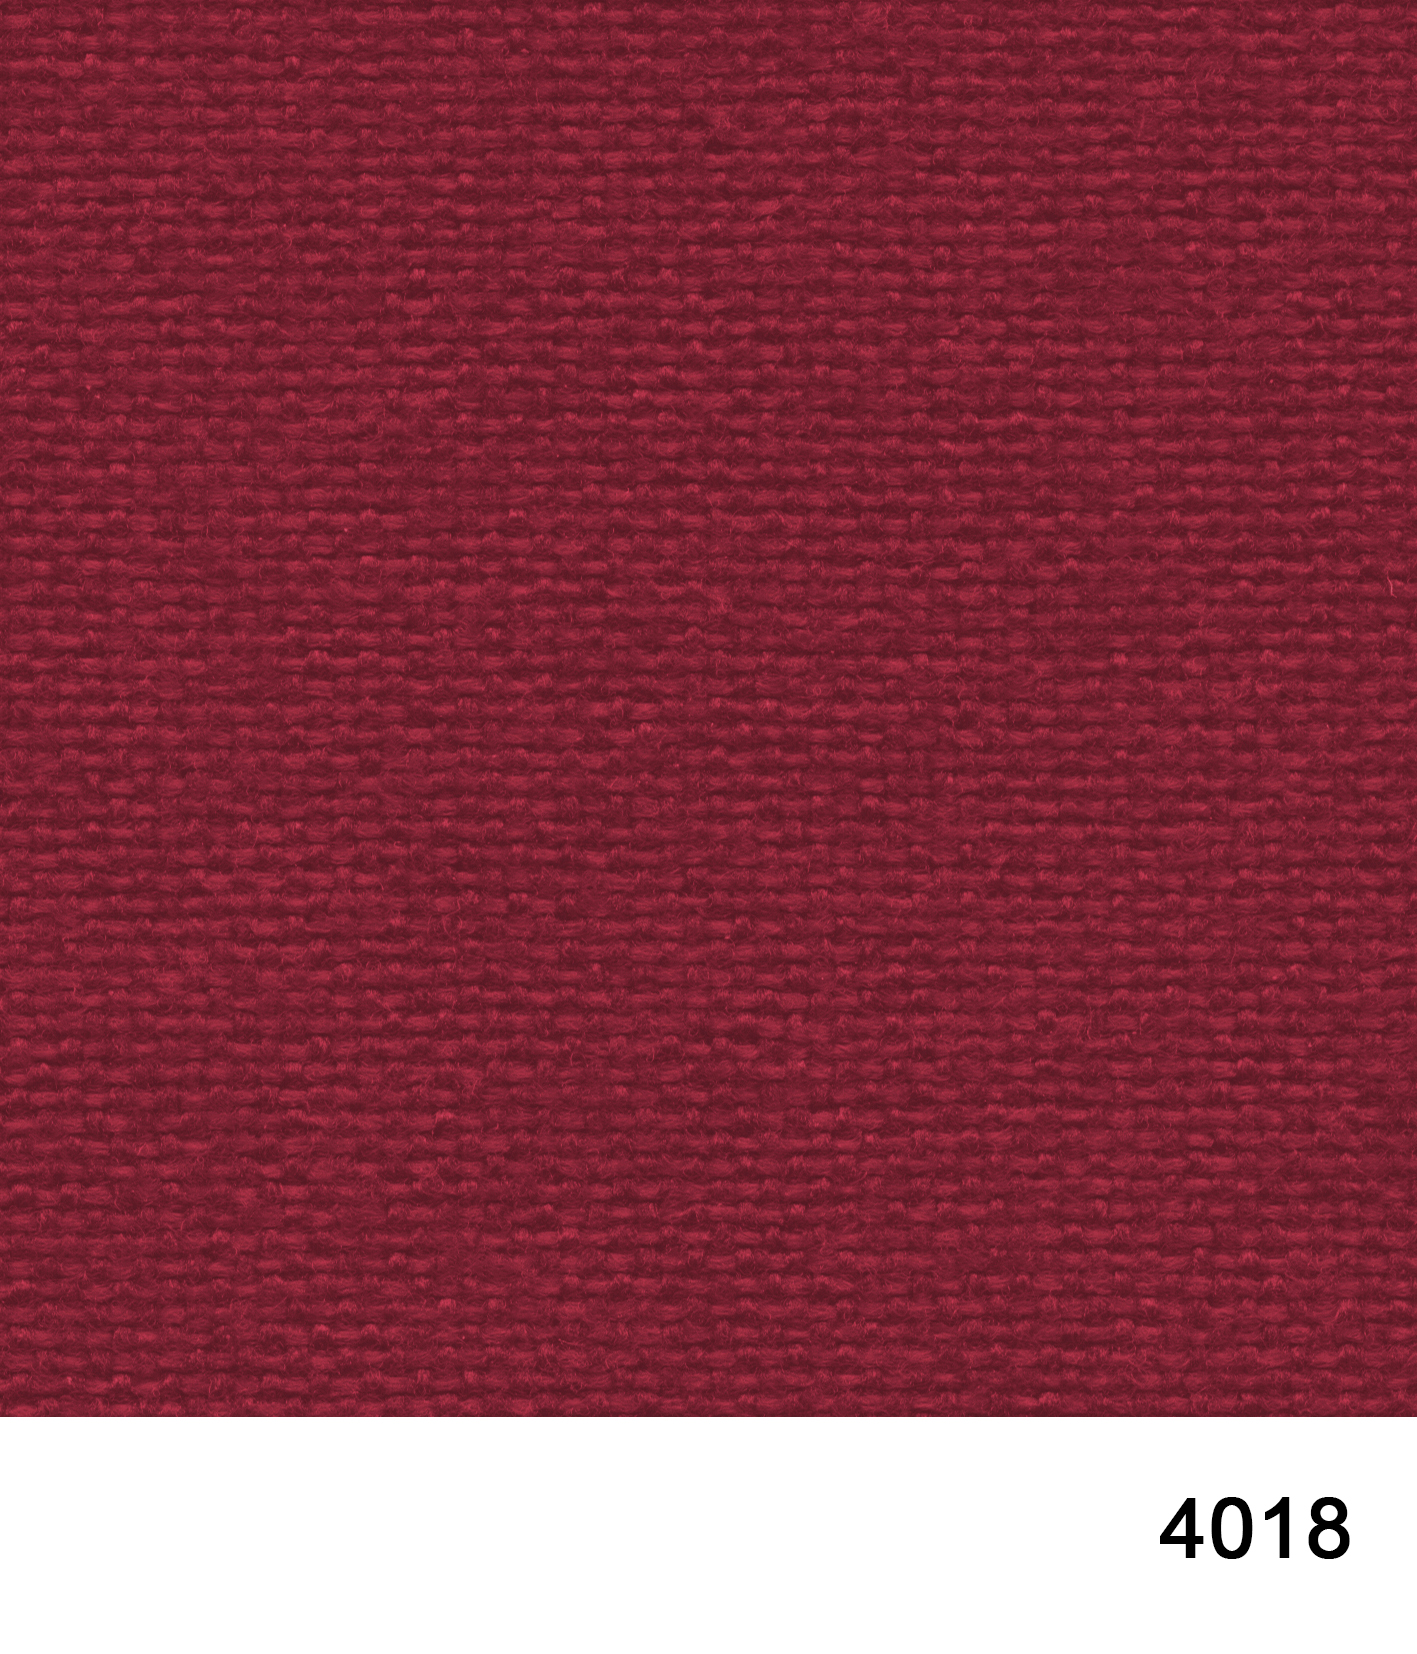 JET BIOACTIVE 3155